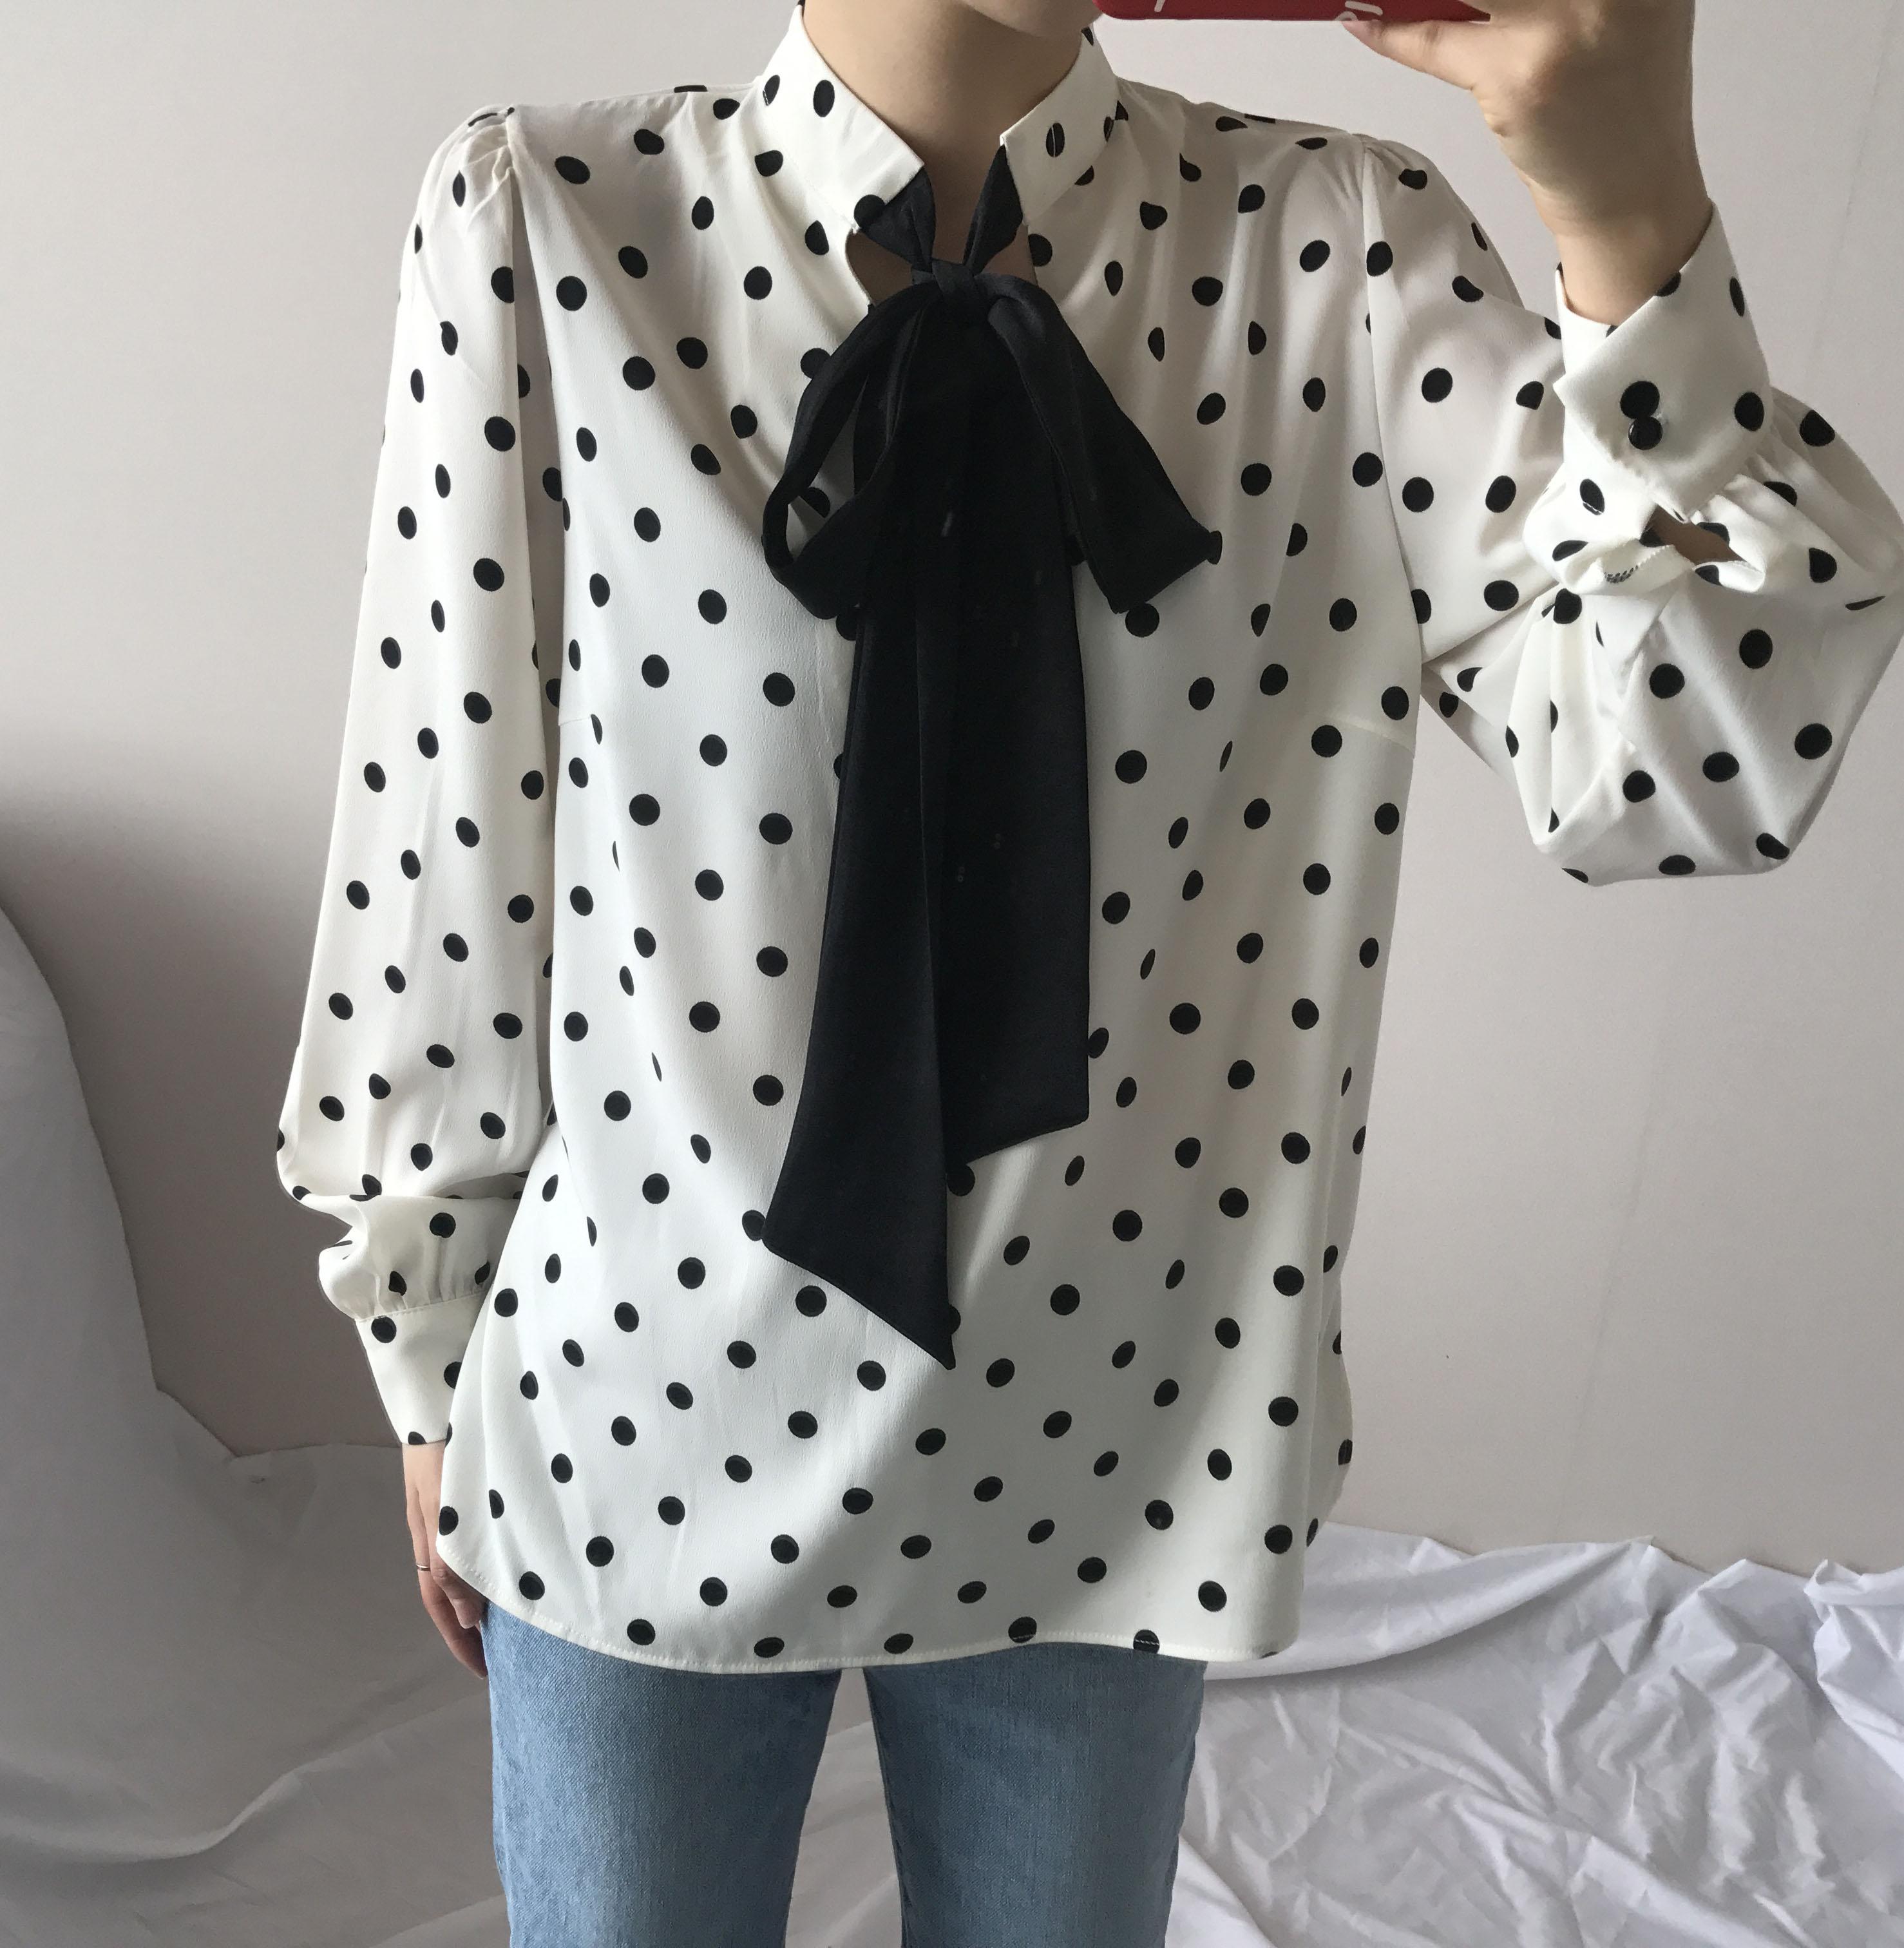 99aa3cfd6ba Vintage Polka Dot Dresses - 50s Spotty and Ditsy Prints